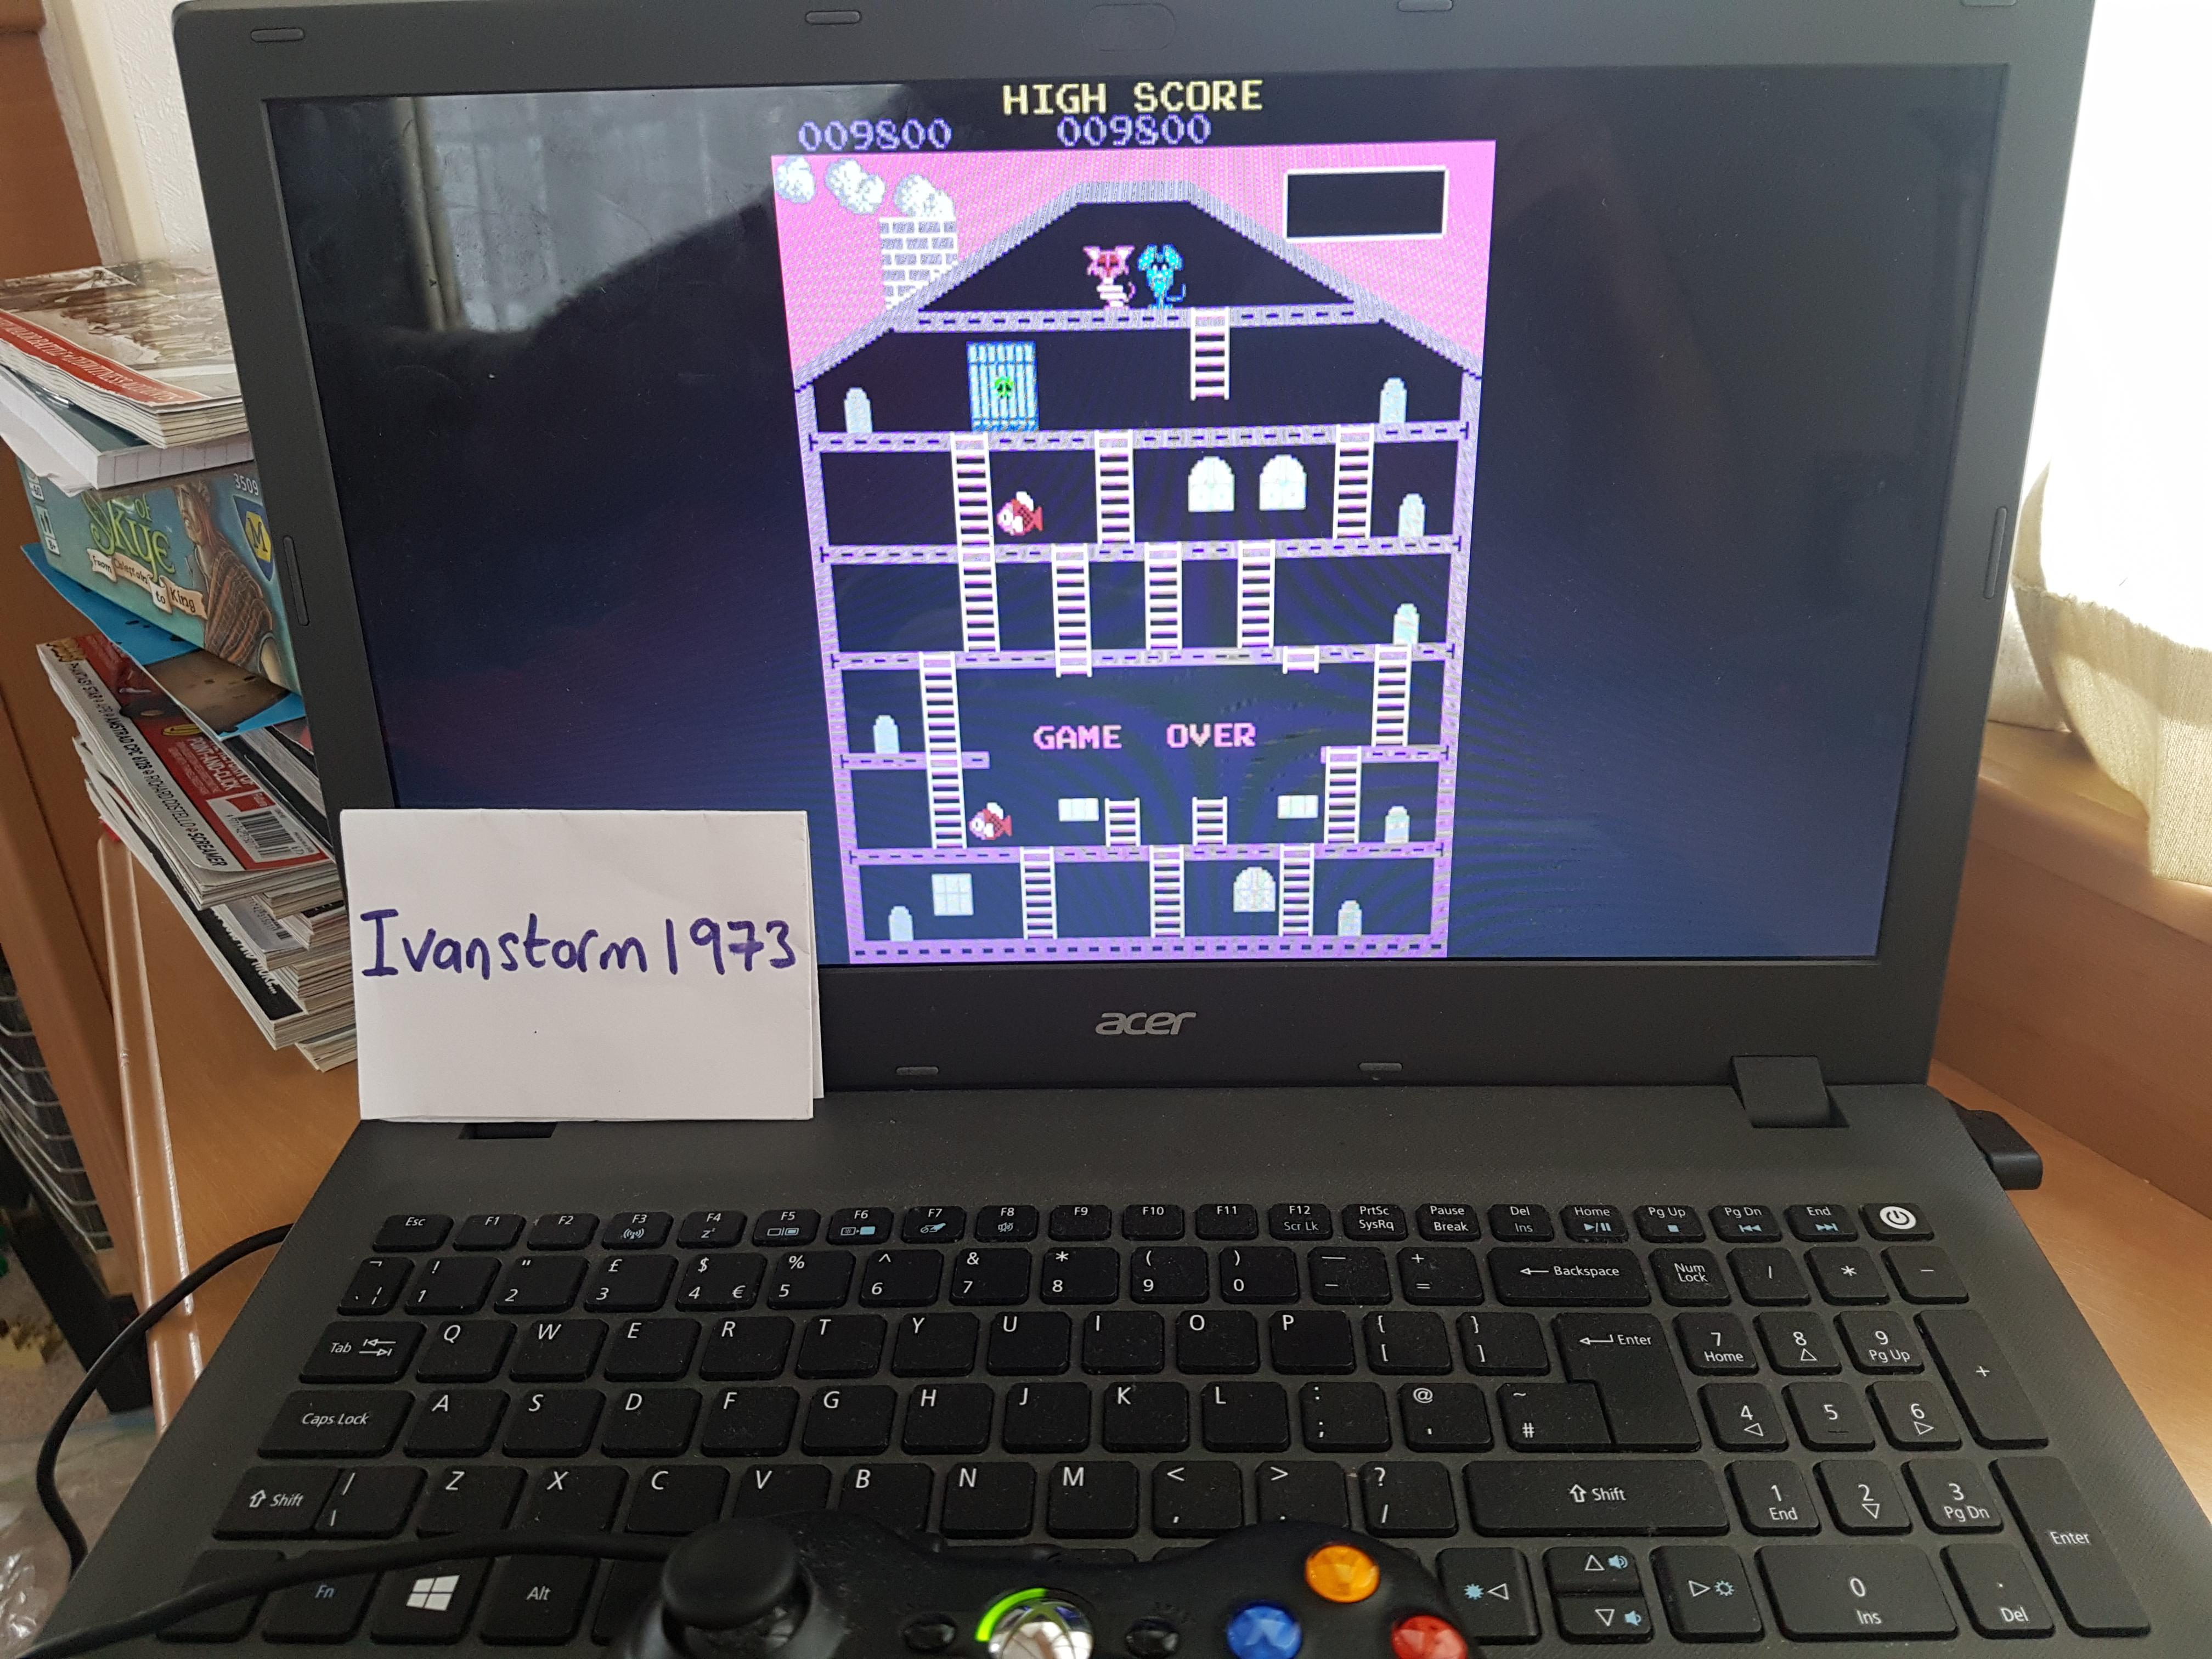 Mouser [mouser] 9,800 points